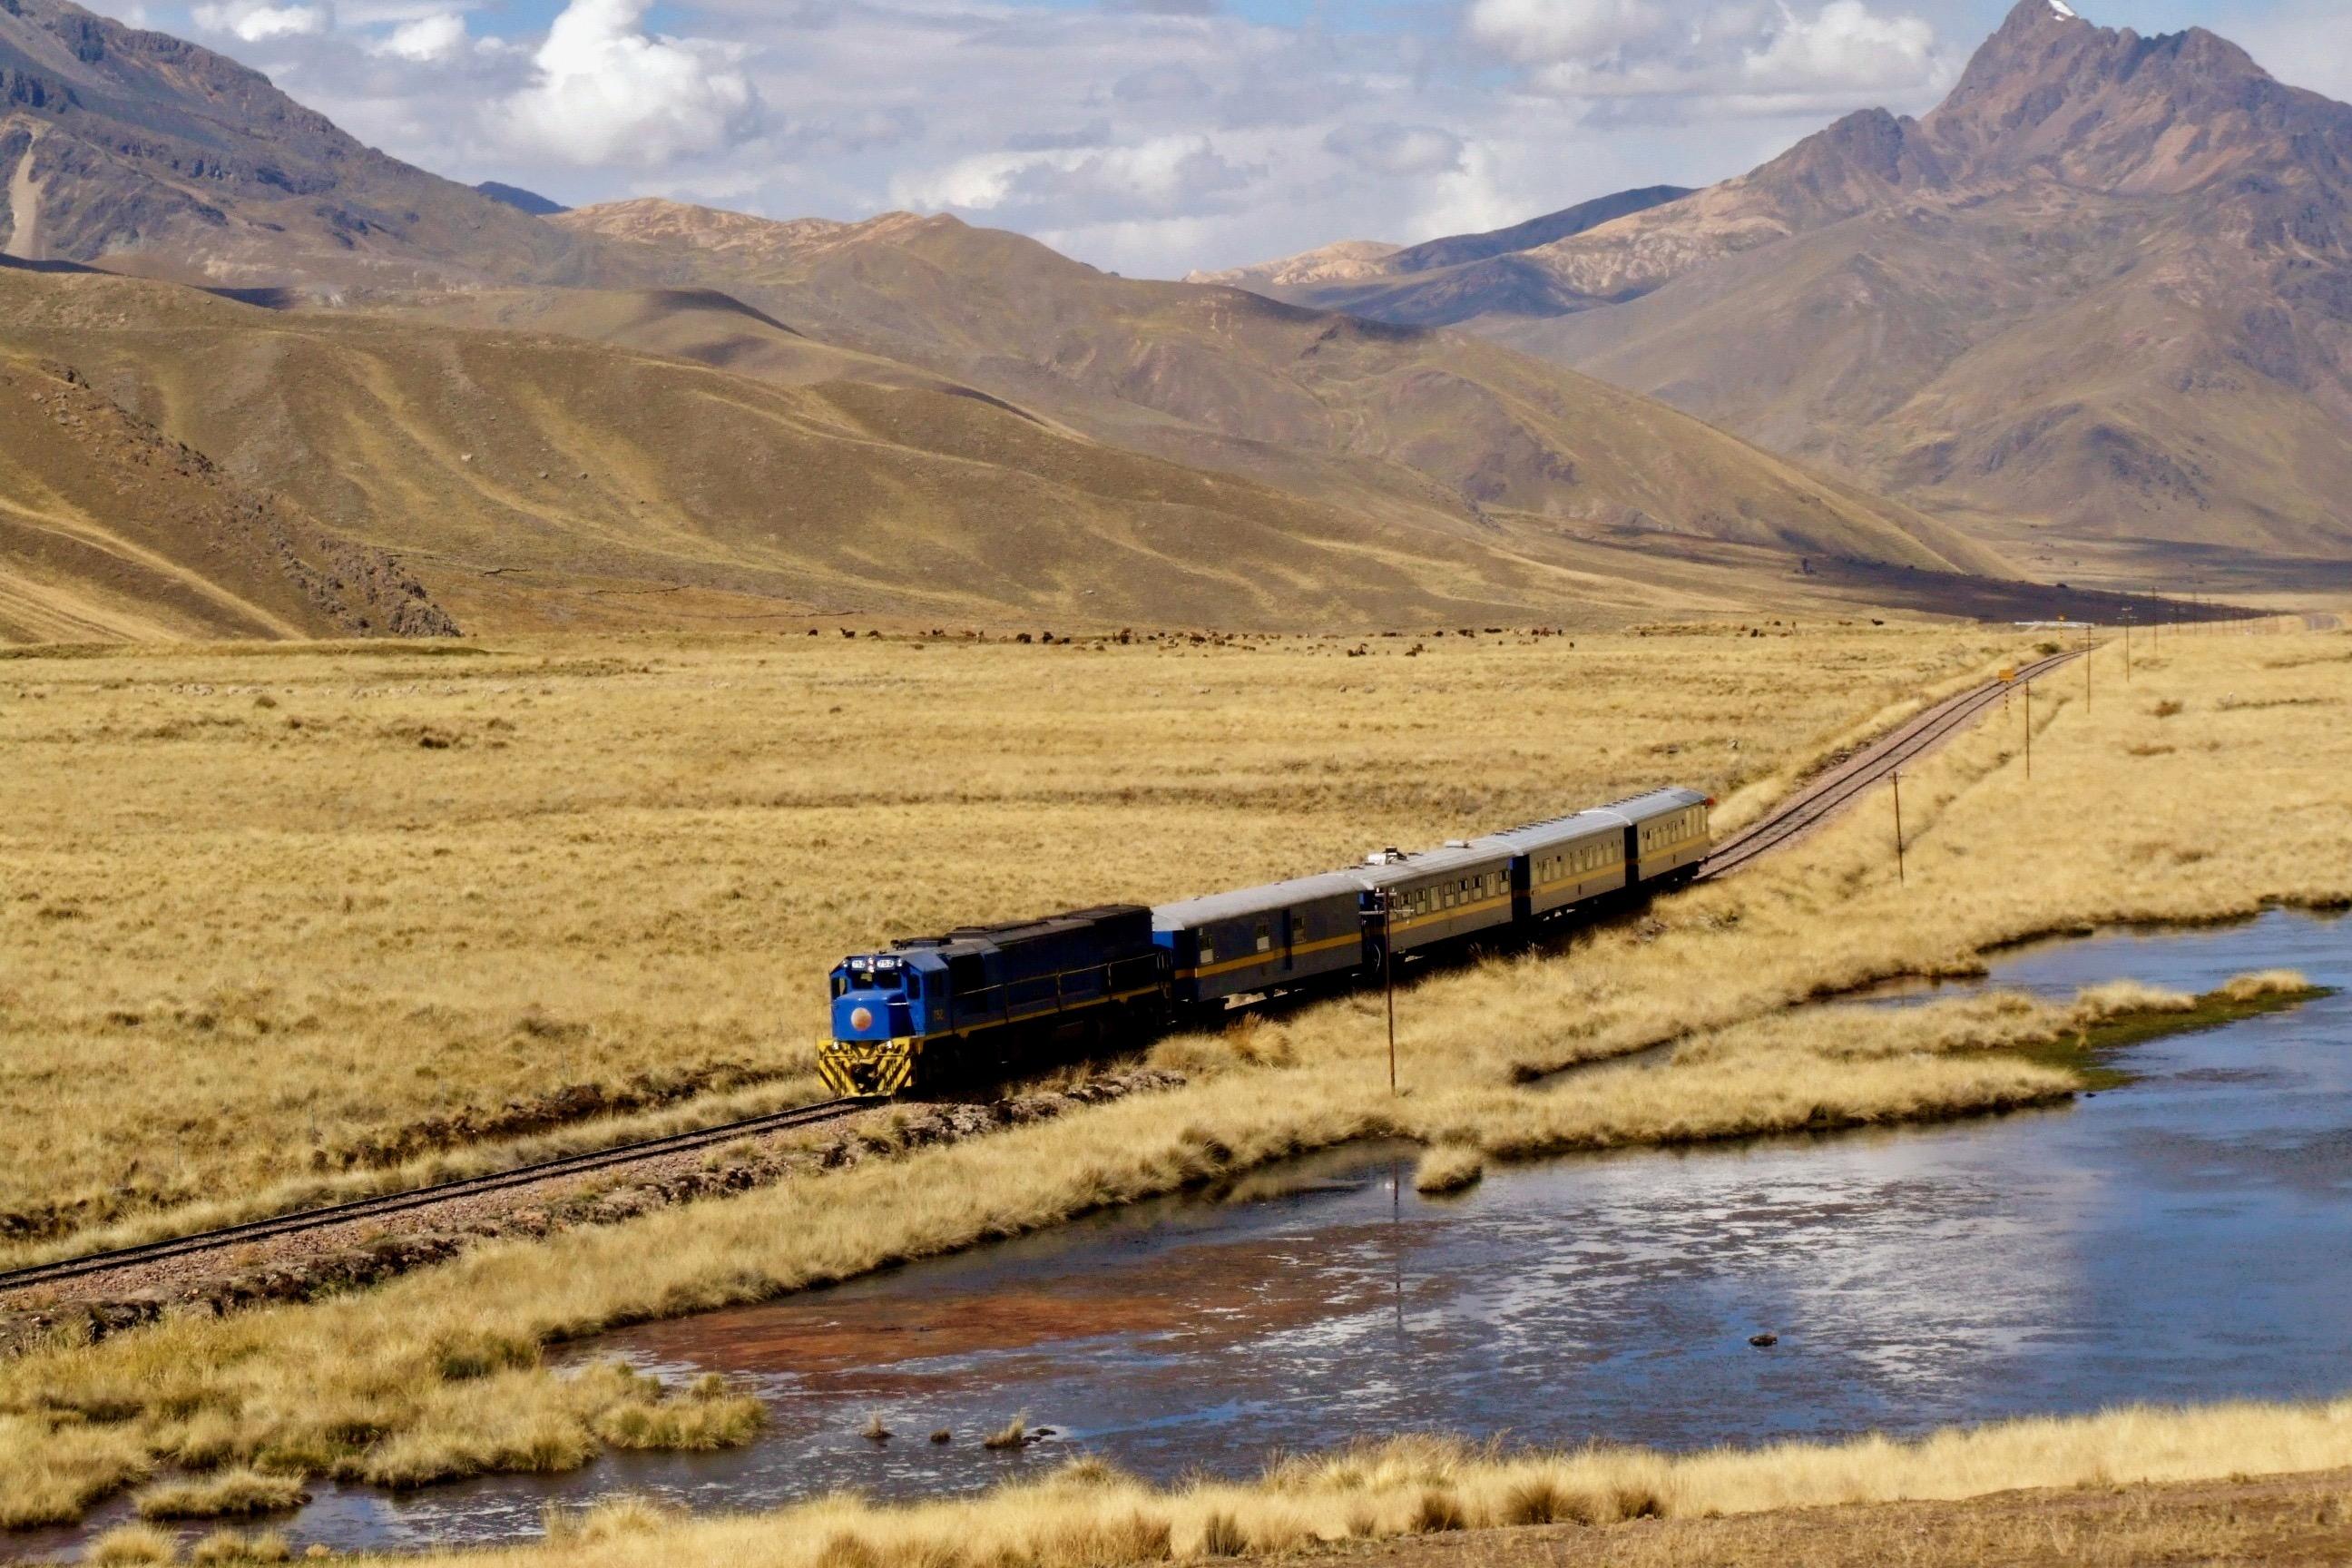 Lake Titicaca Train on its way to Juliaca, Peru